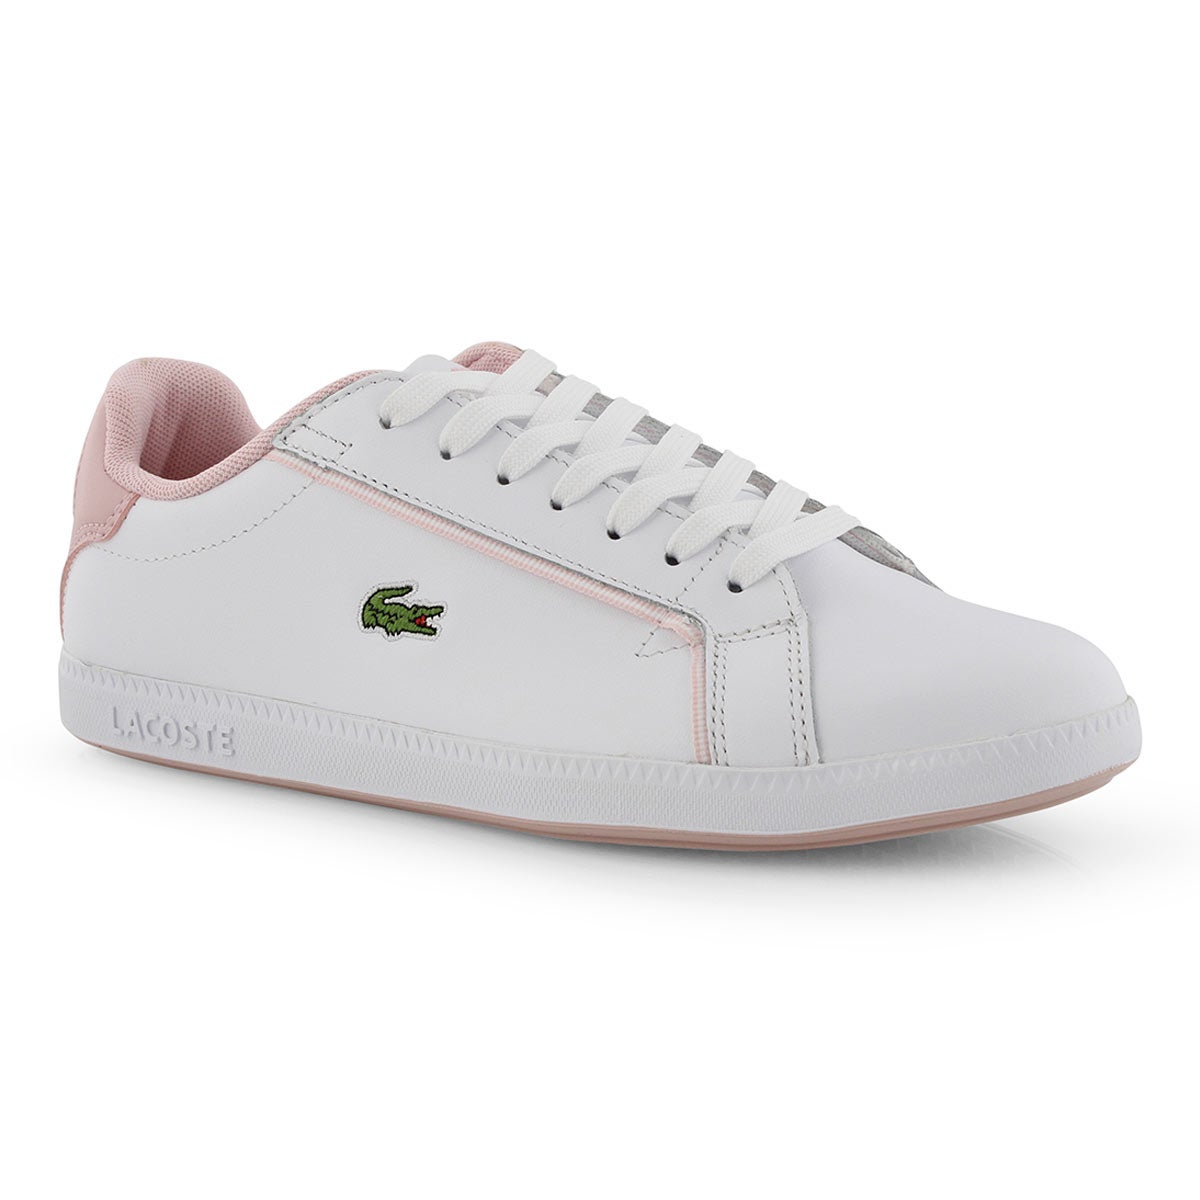 Lds Graduate 119 1 wht/pnk sneaker